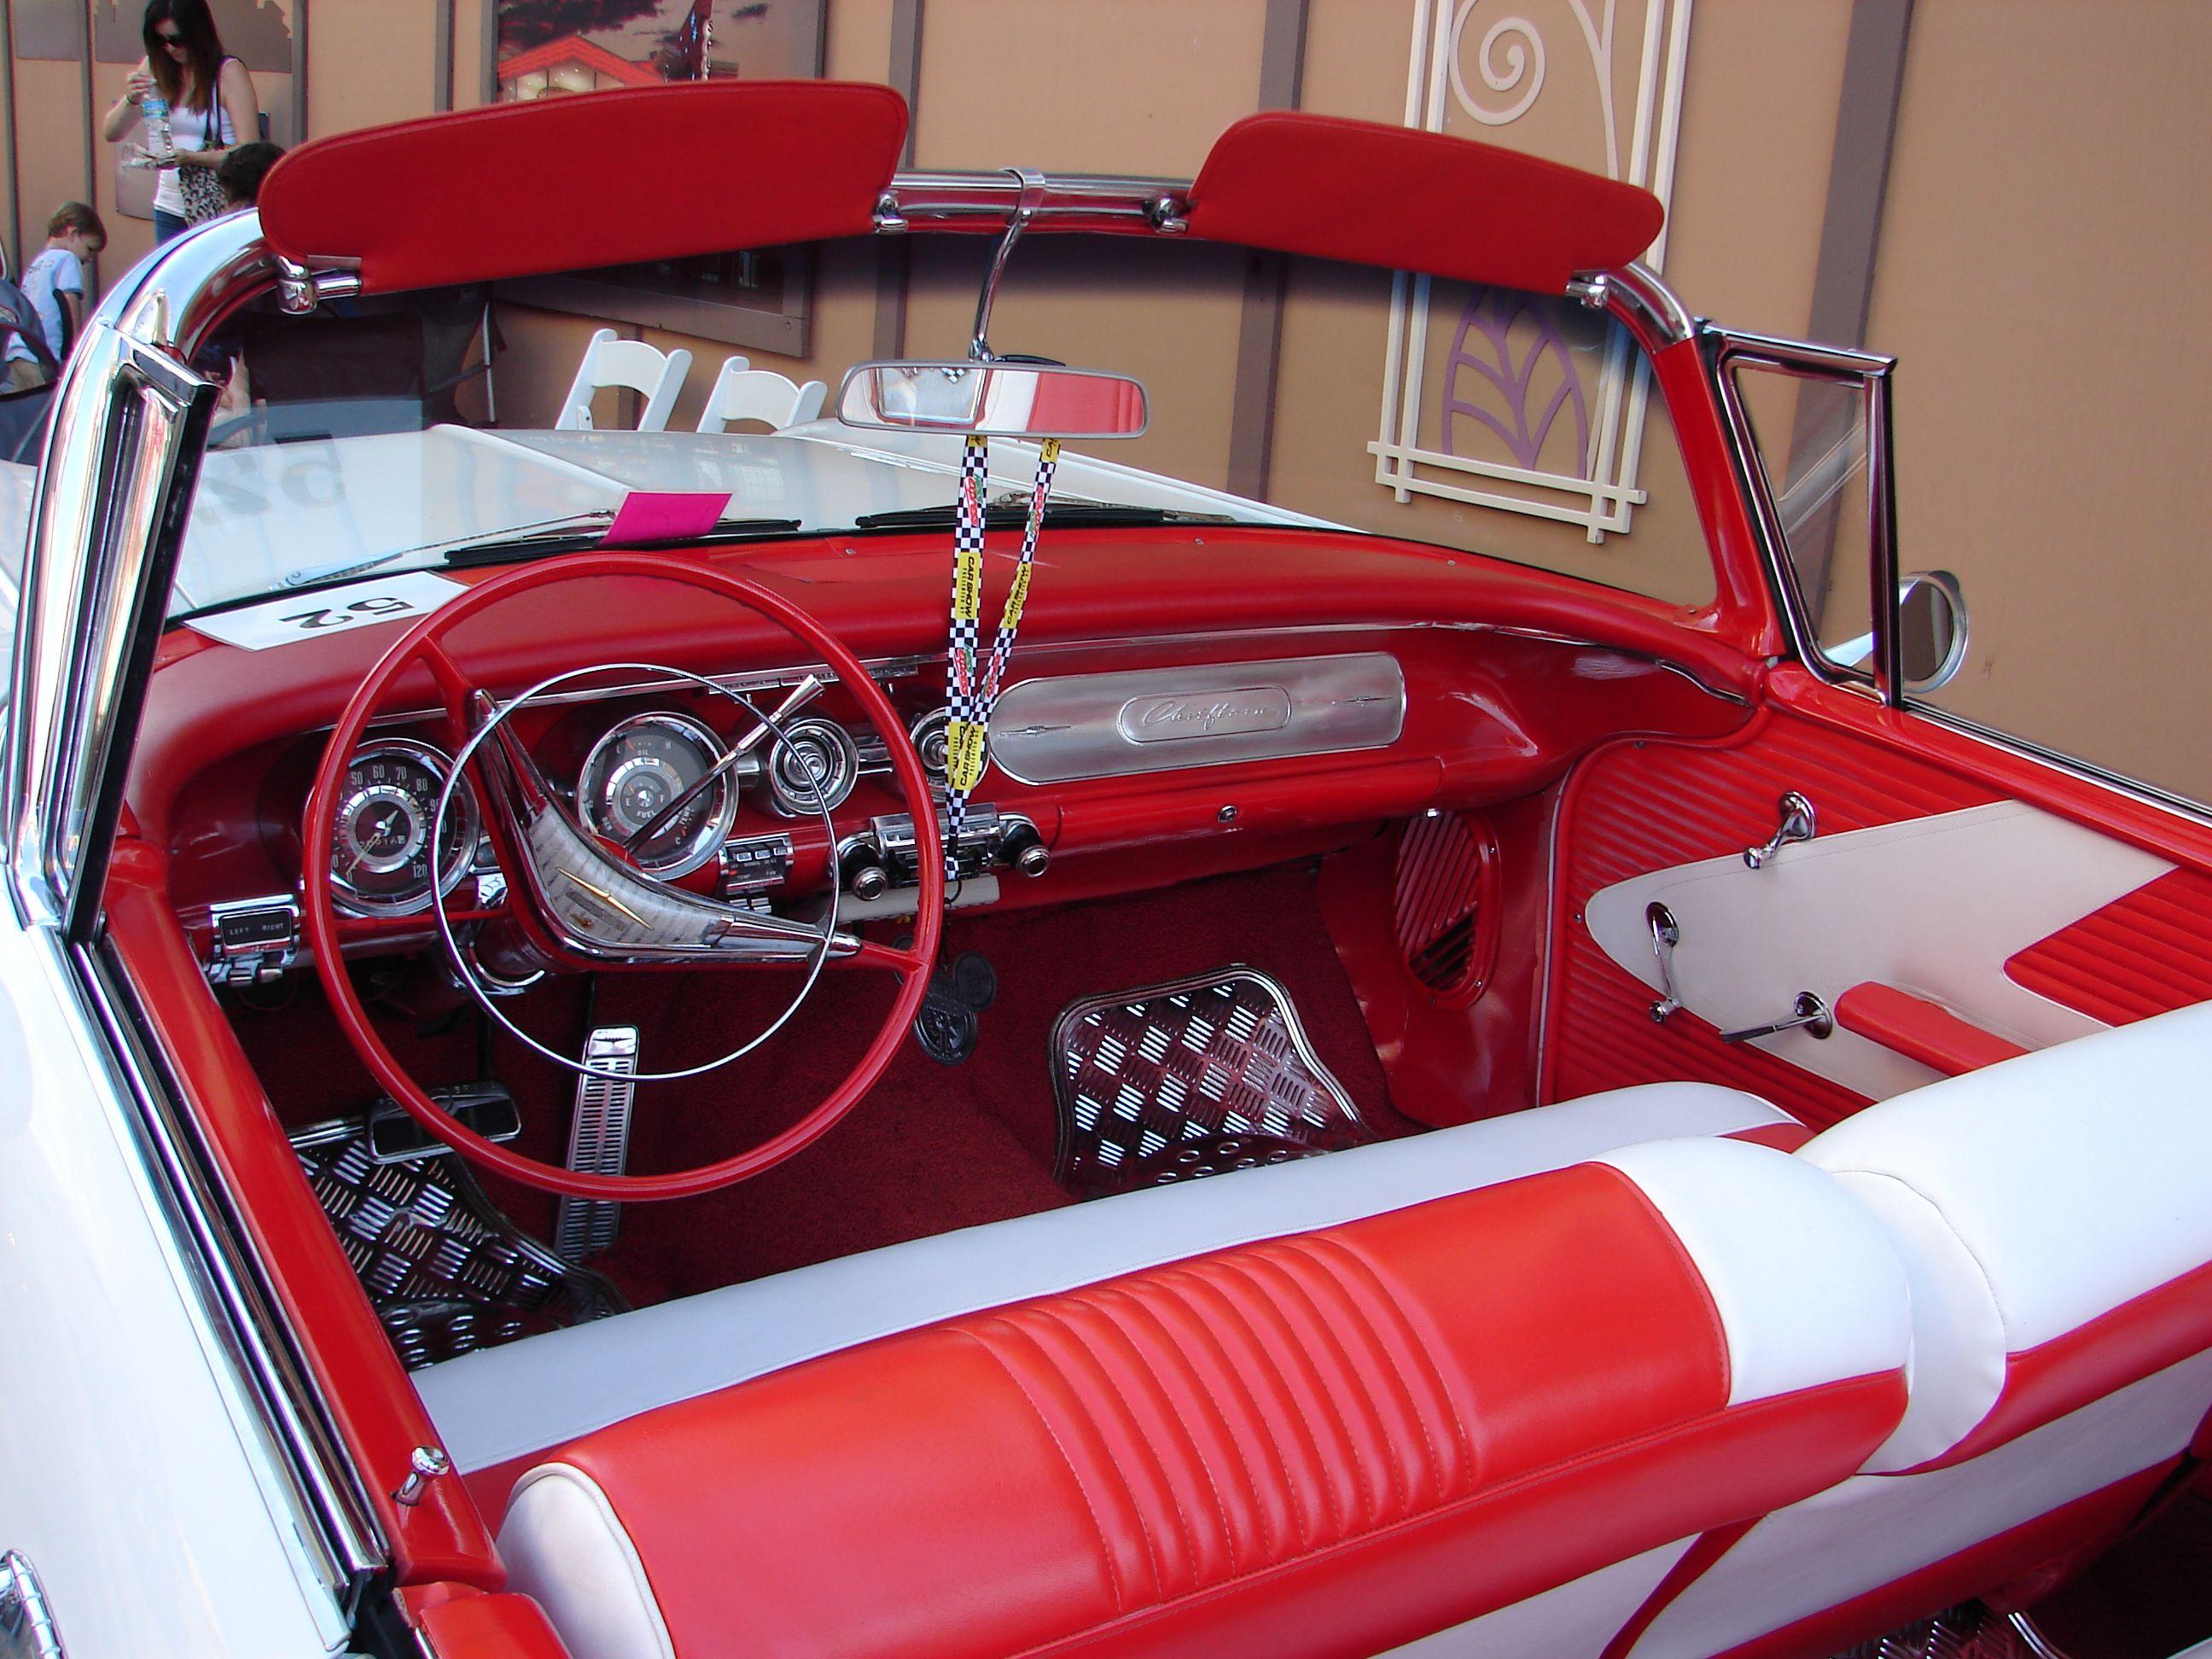 Kunstplakate Antiquitäten & Kunst PHOTOGRAPHY CAR AUTOMOBILE CLASSIC HEADLIGHT FENDER ART POSTER PRINT BMP11048